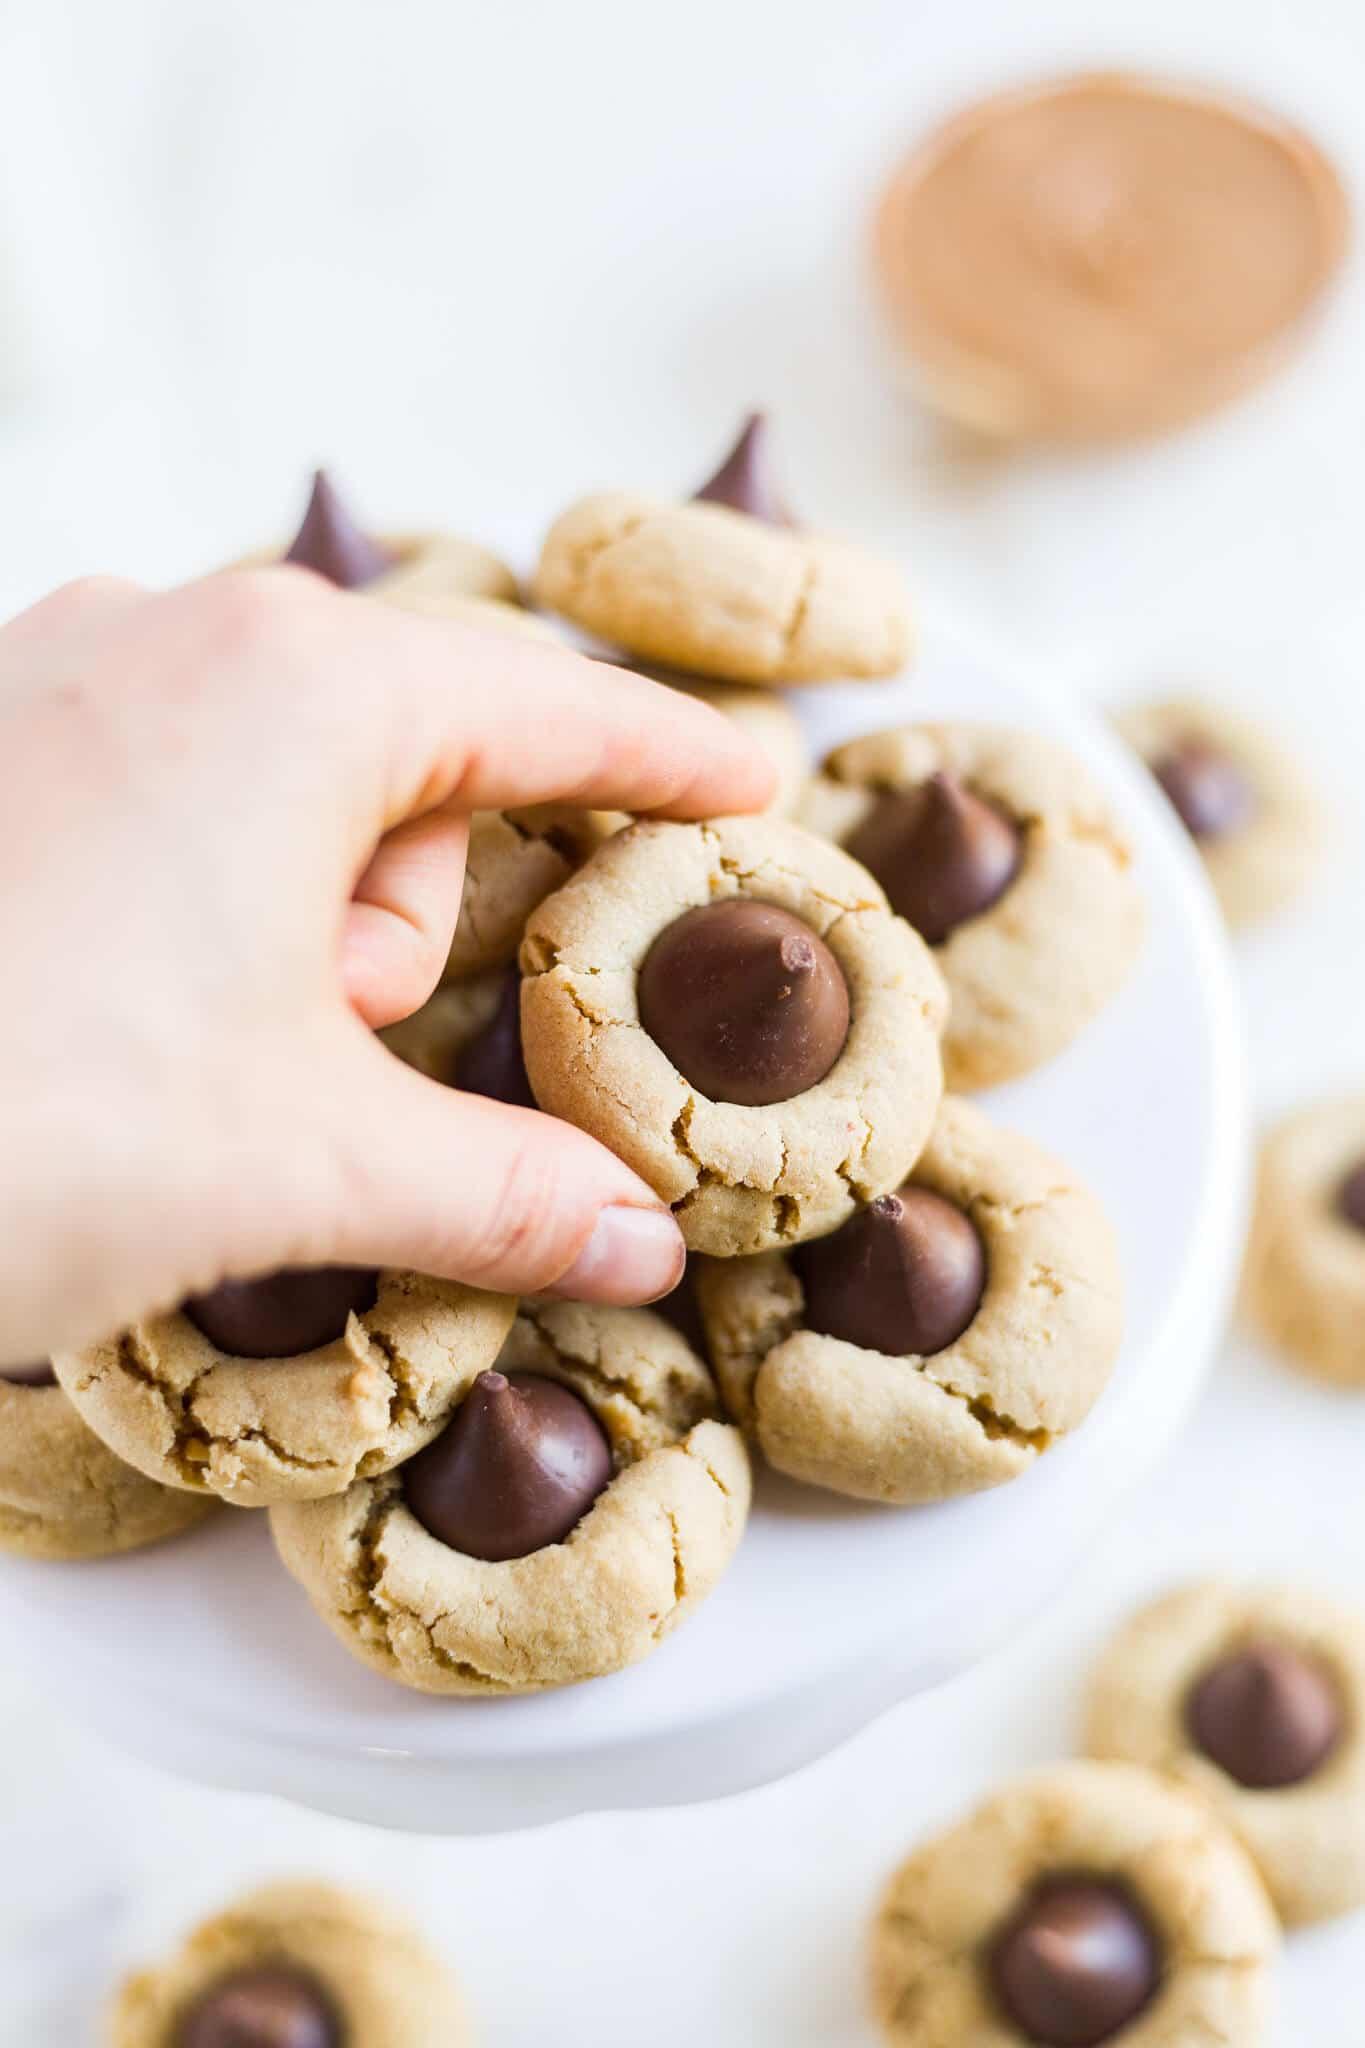 Hershey's peanut butter blossoms gluten free